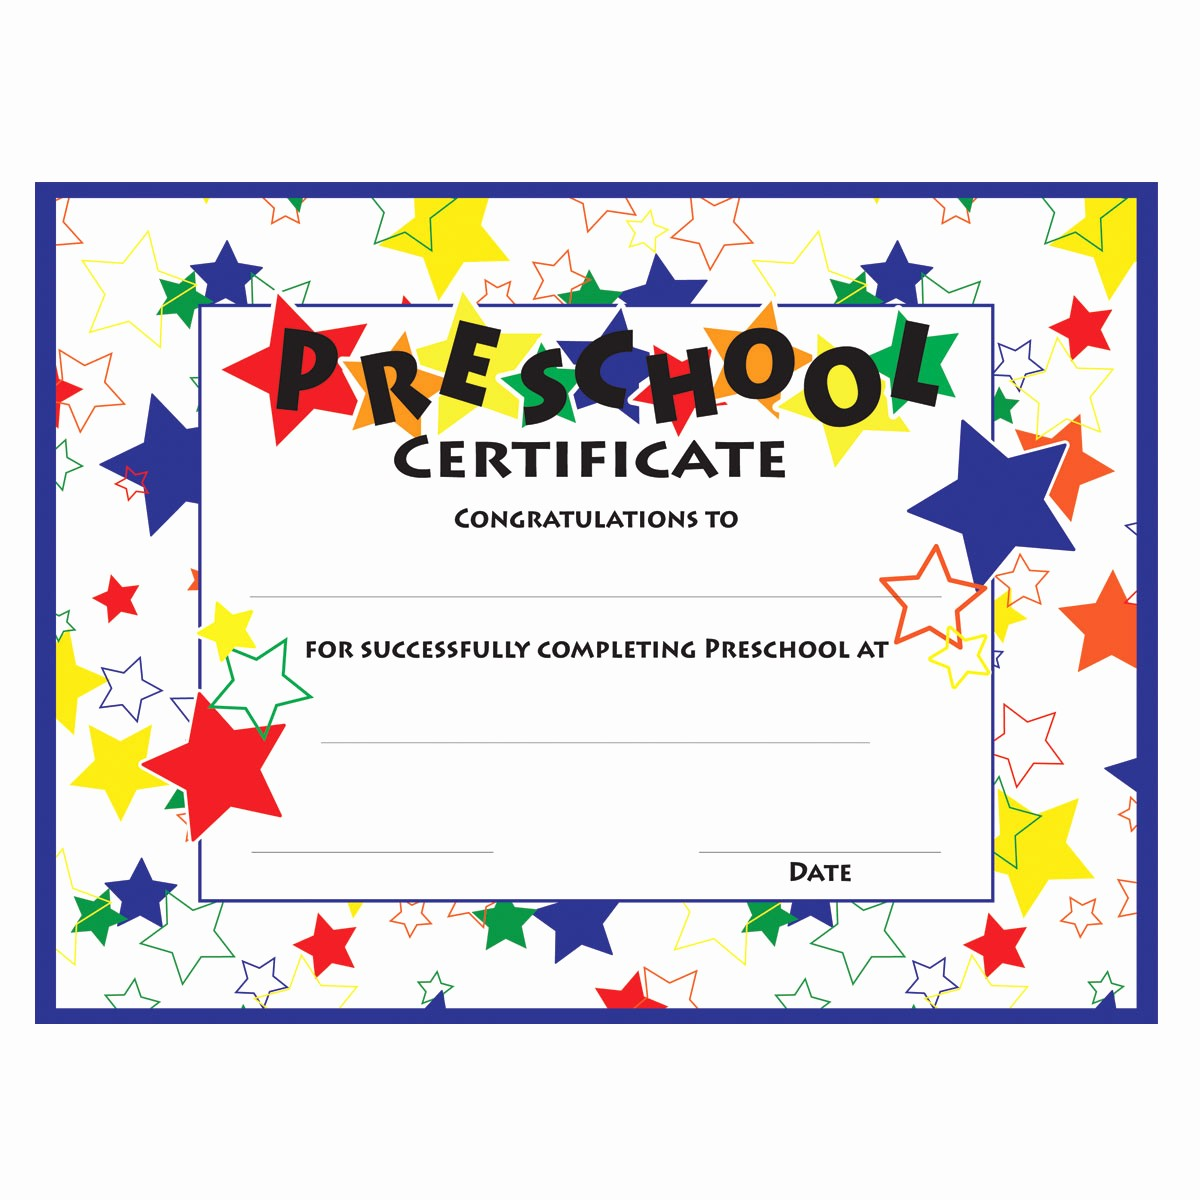 Free Printable Kindergarten Certificate Templates New 11 Preschool Certificate Templates Pdf